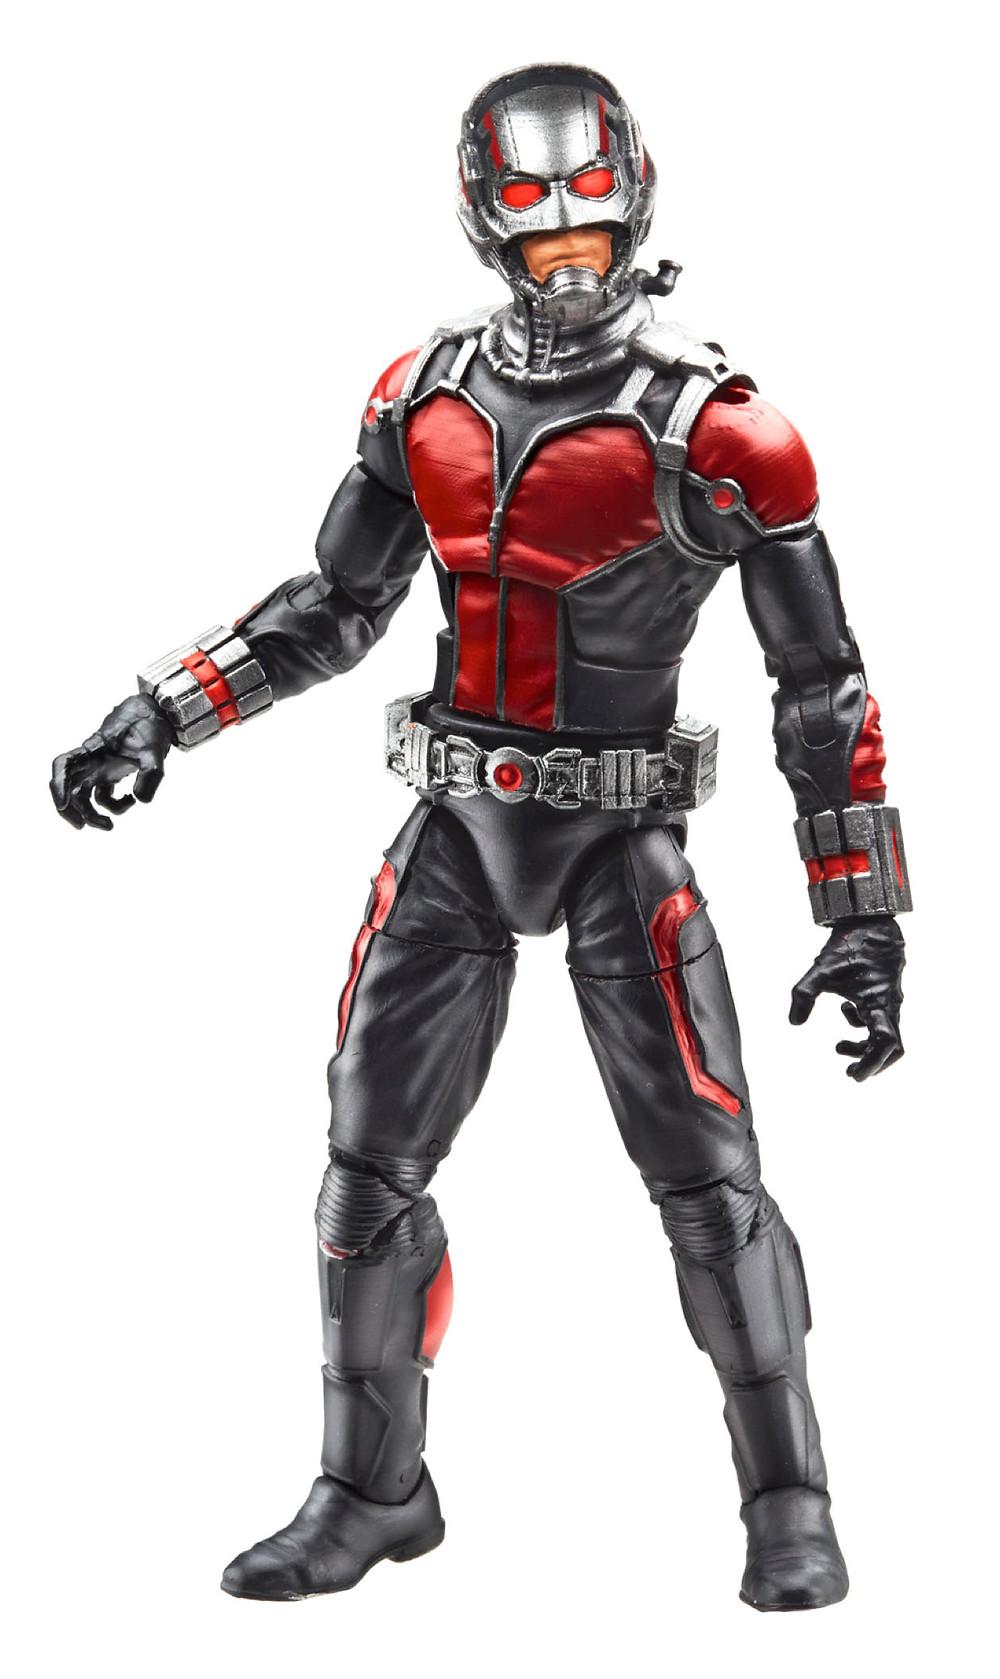 Ant-Man-Legends-Ant-Man.jpg